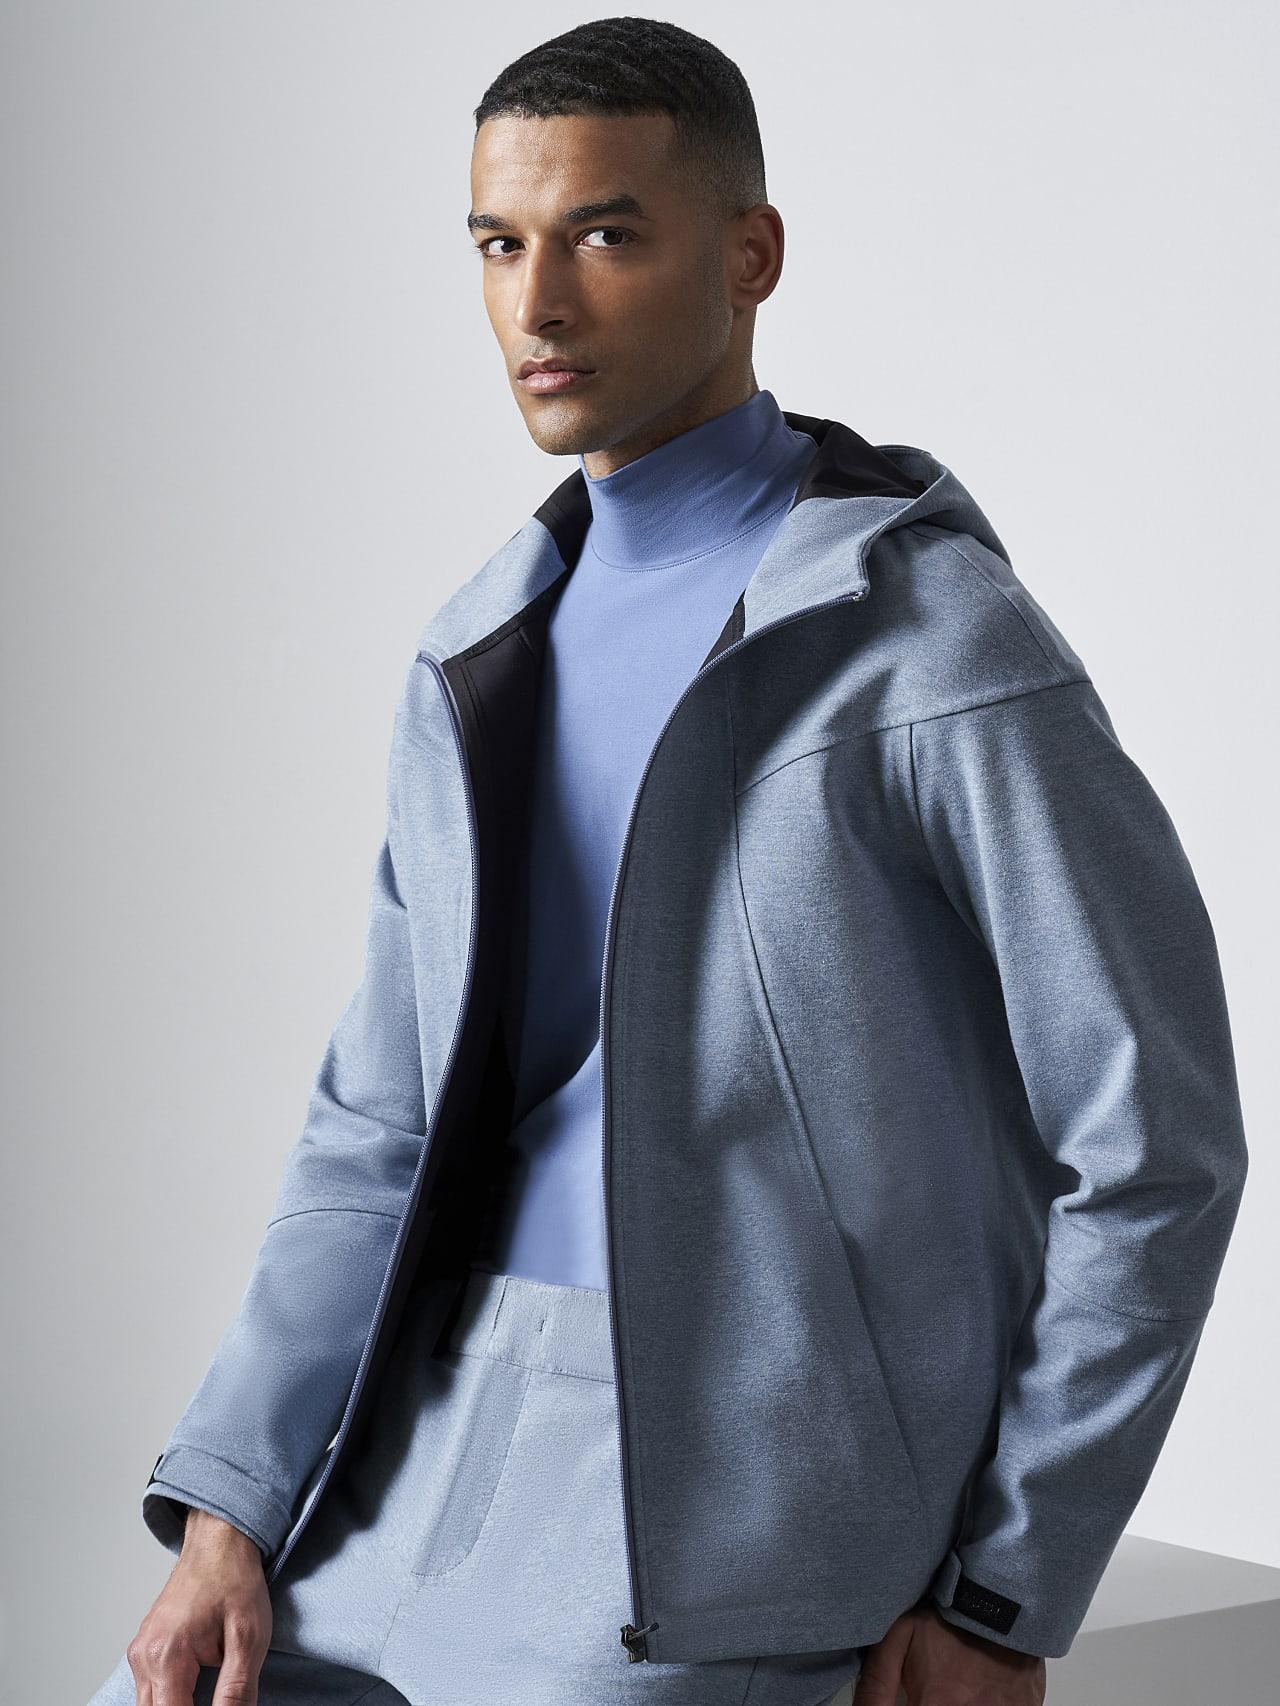 SROTE V1.Y5.02 Waterproof Sweatjacket medium blue Model shot Alpha Tauri